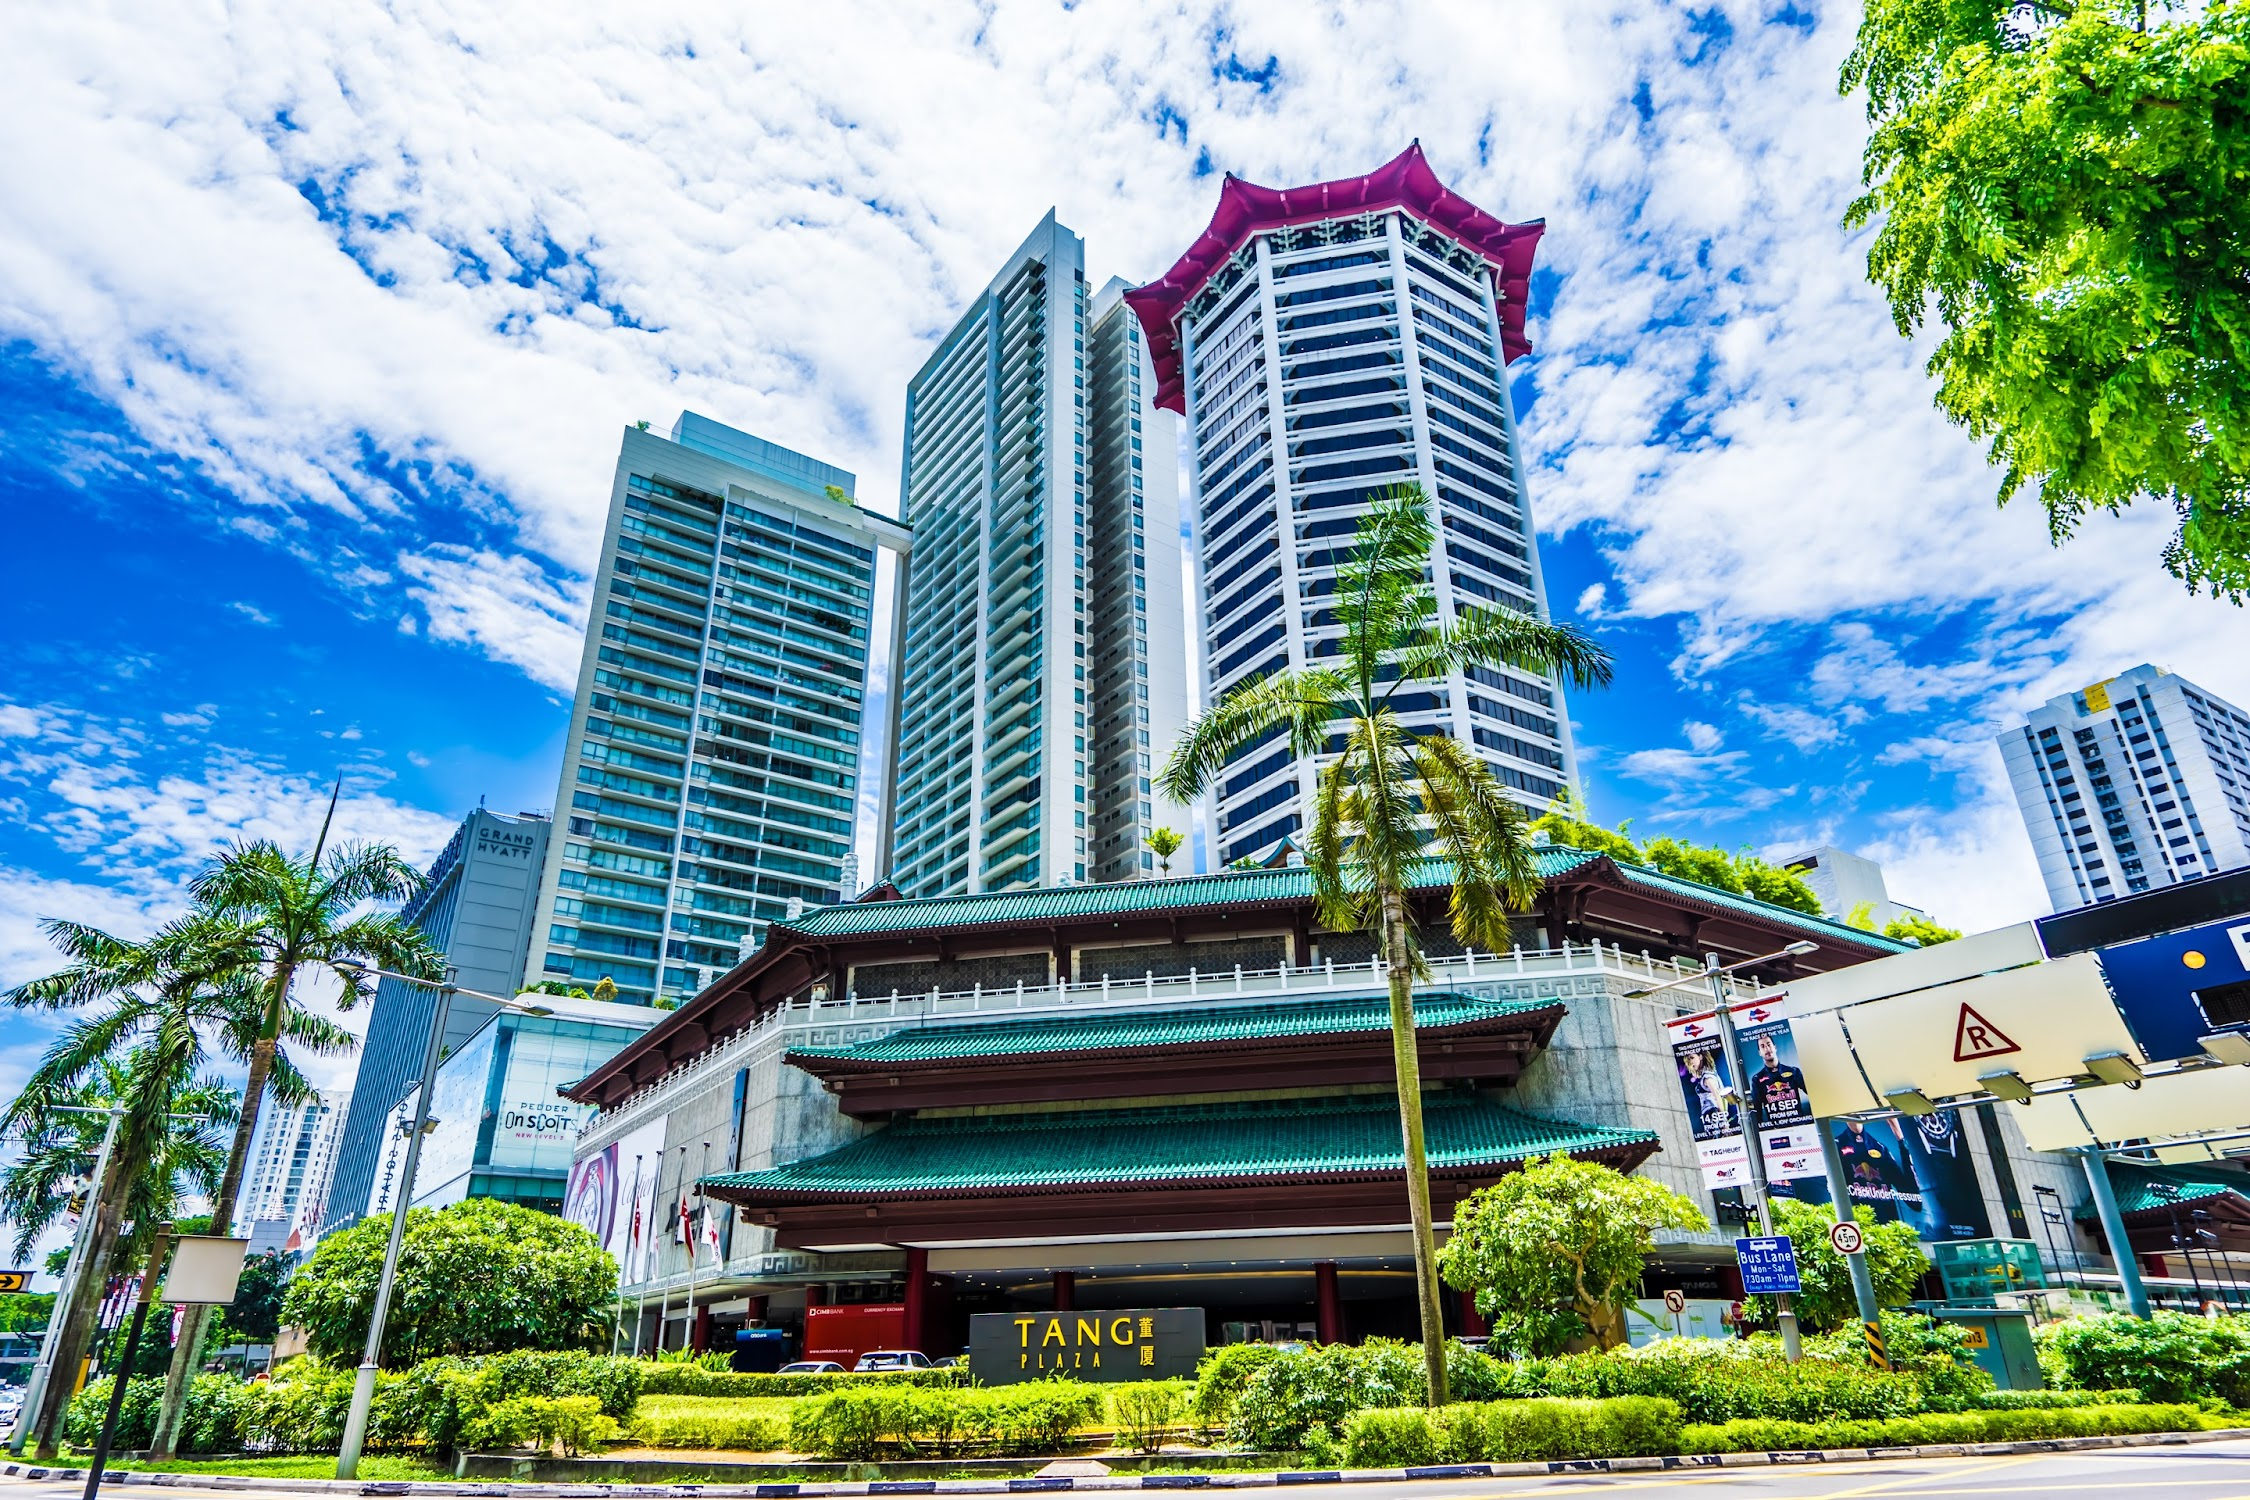 Singapore Tang Plaza